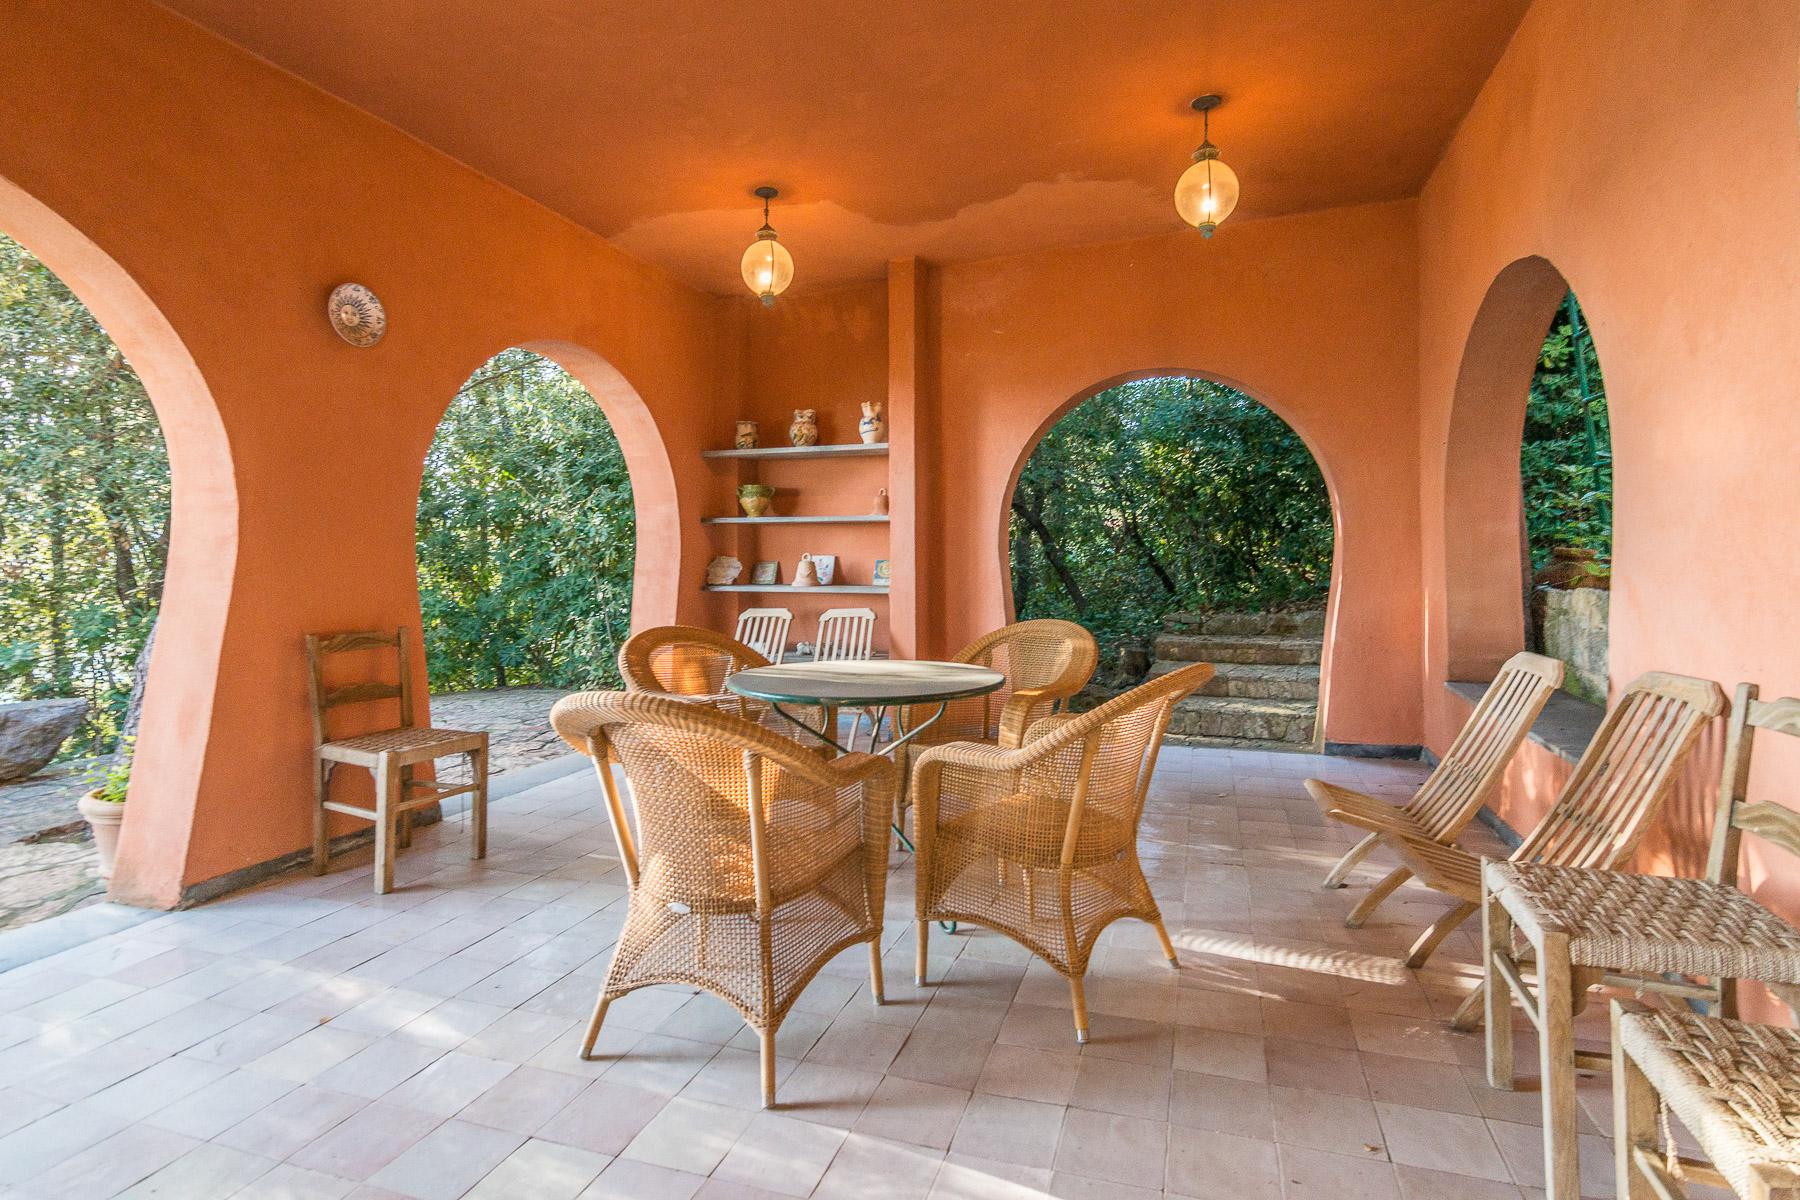 Villa in Vendita a Lerici: 5 locali, 330 mq - Foto 8